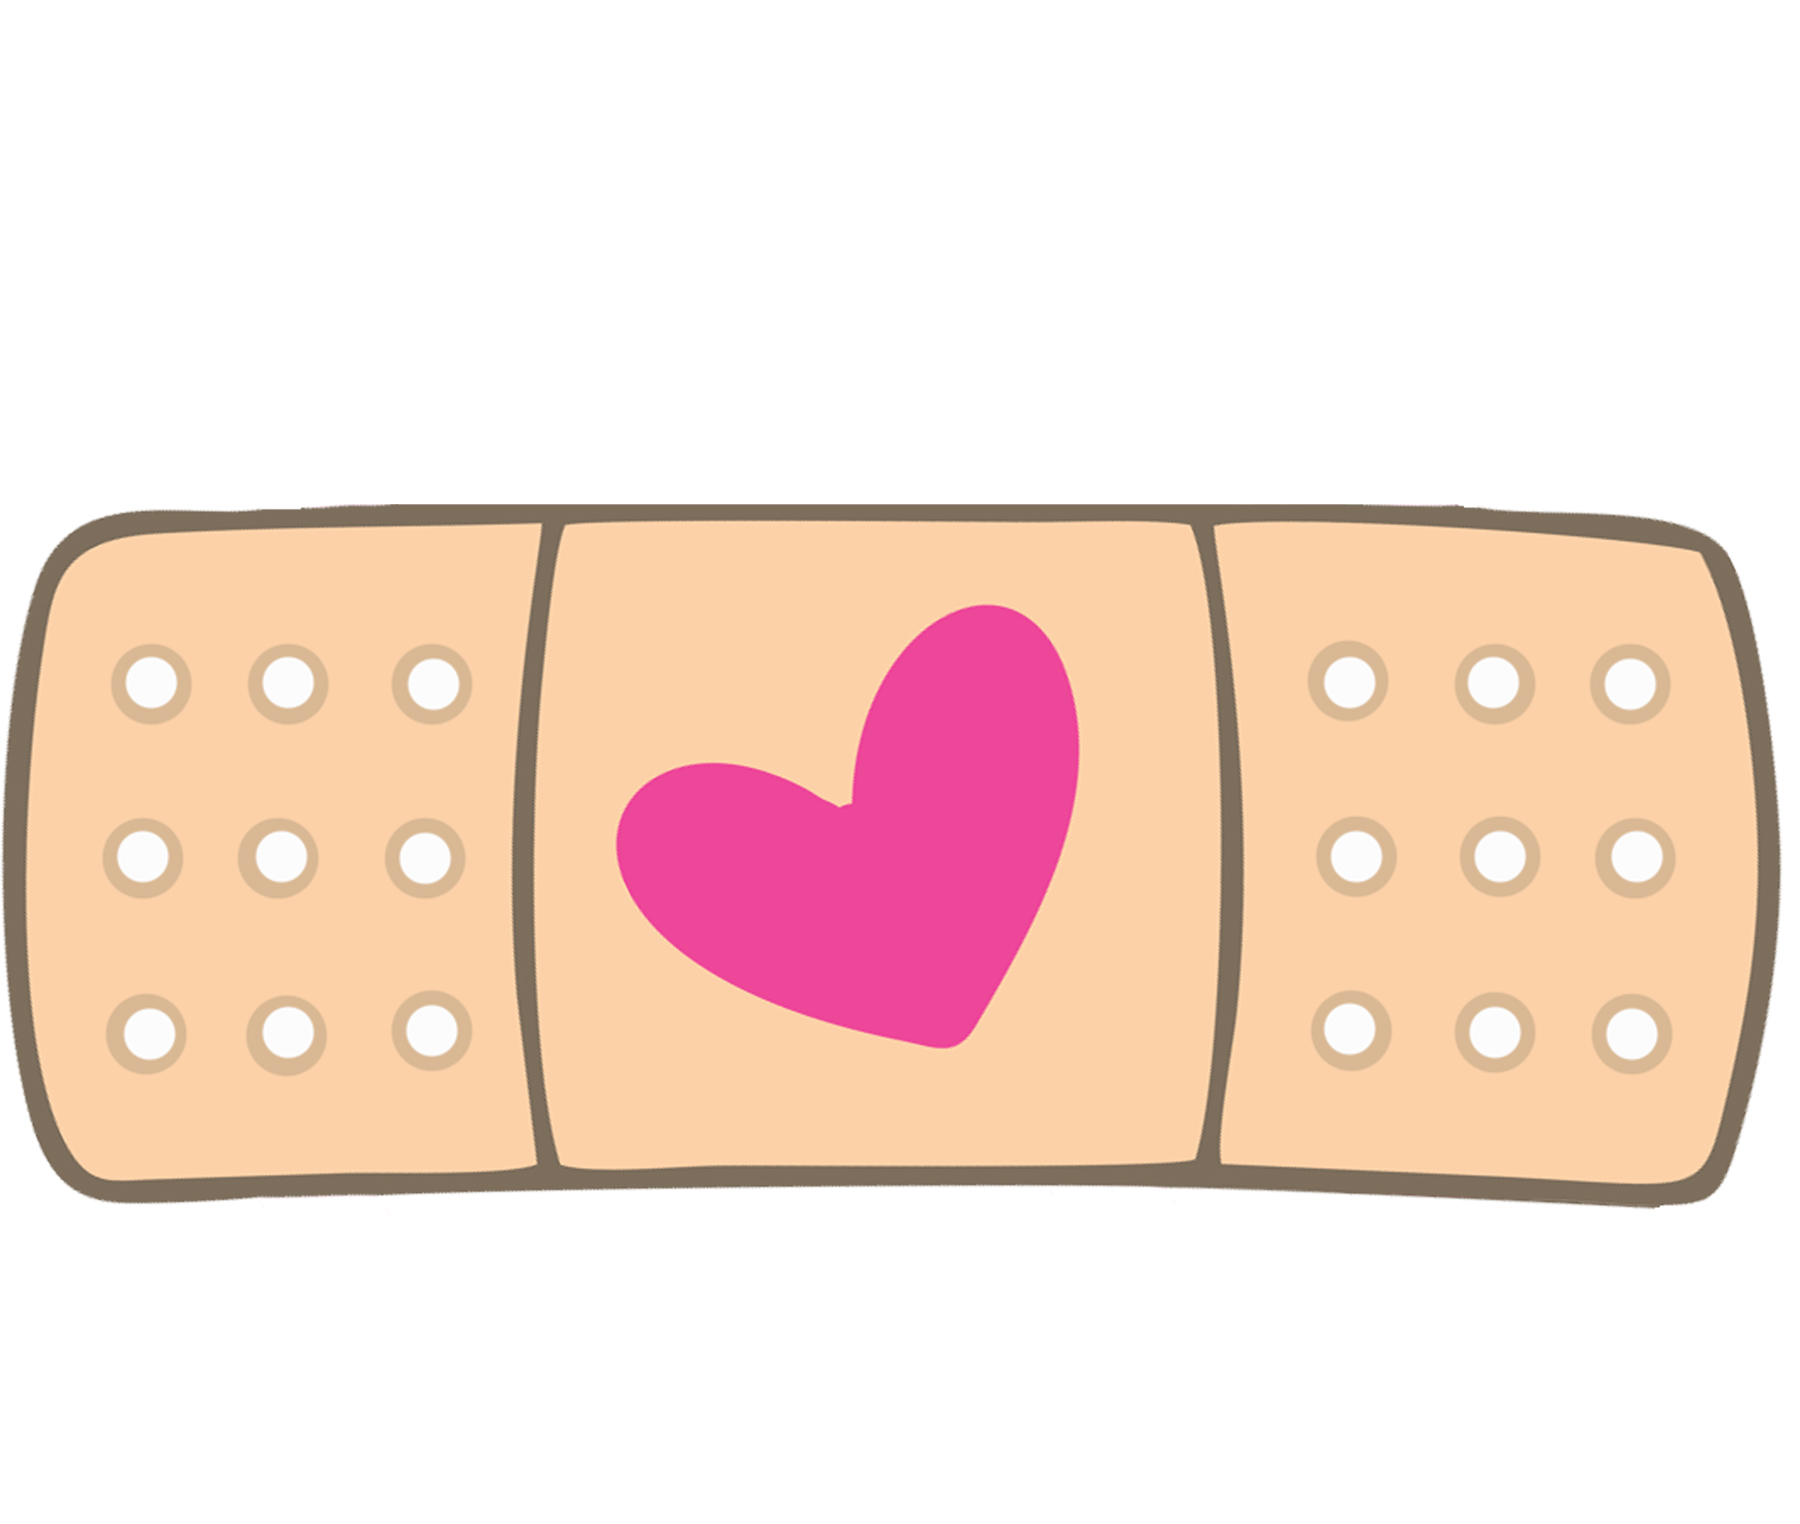 Bandage clip art.